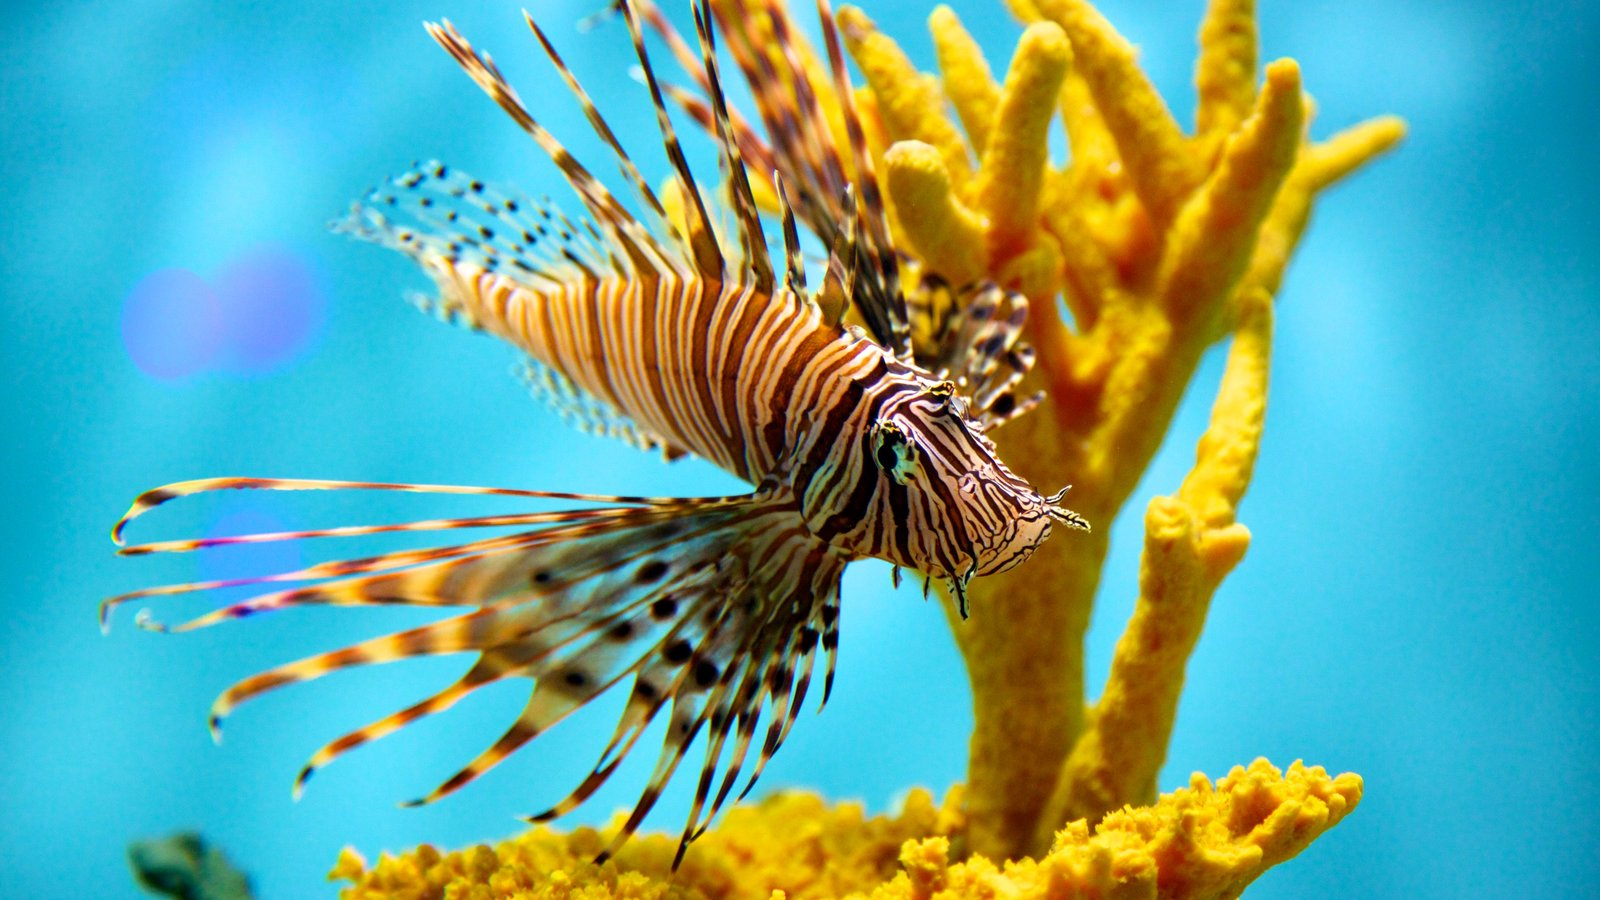 Fish aquarium in niagara falls - Aquarium Of Niagara Which Includes Marine Life And Coral